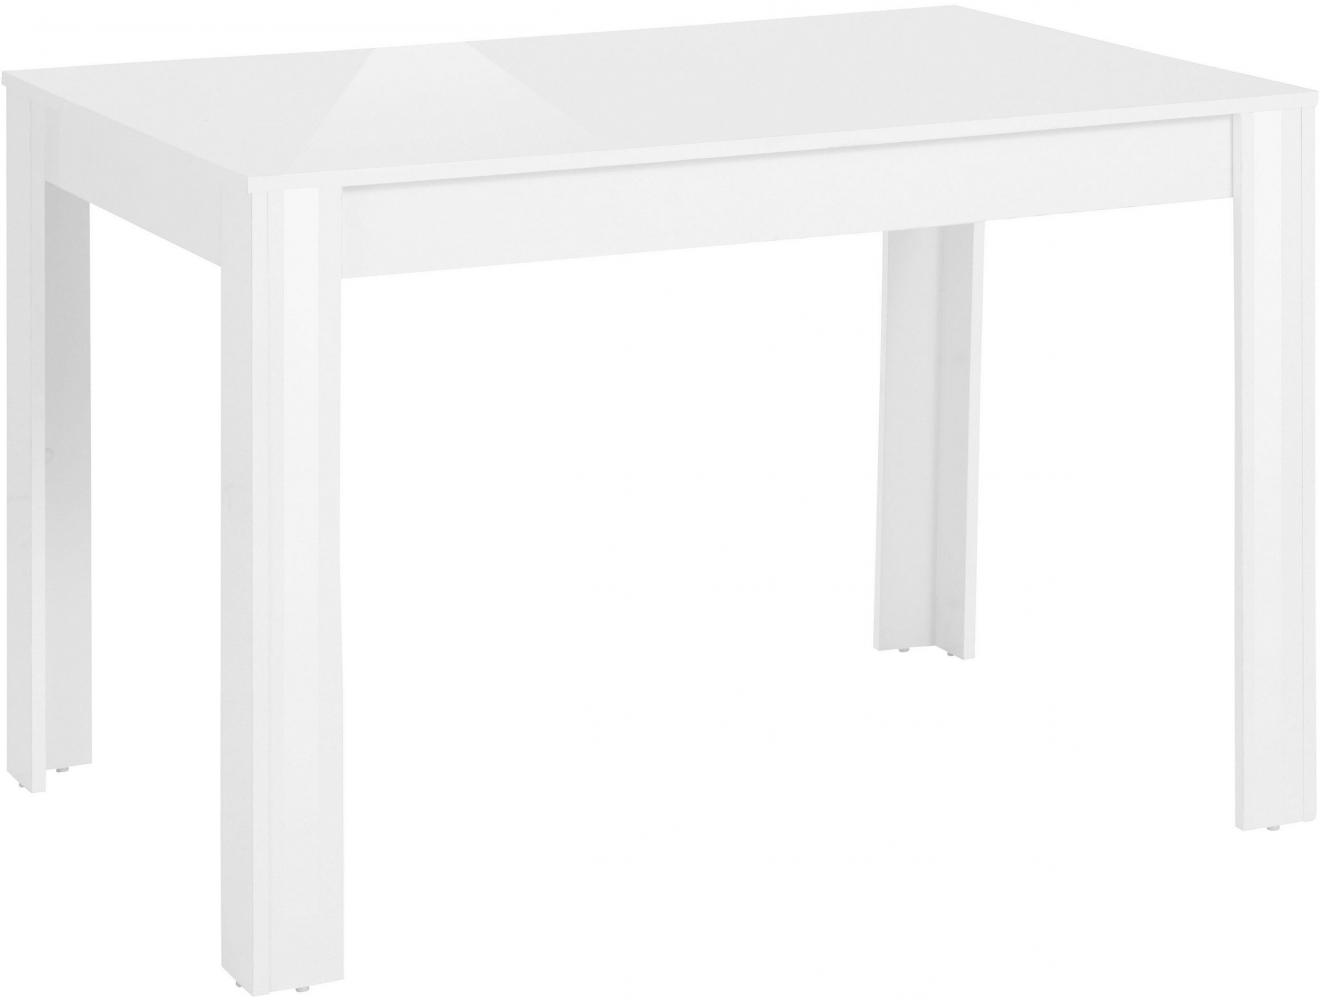 Jídelní stůl Lynet, 120 cm, bílá